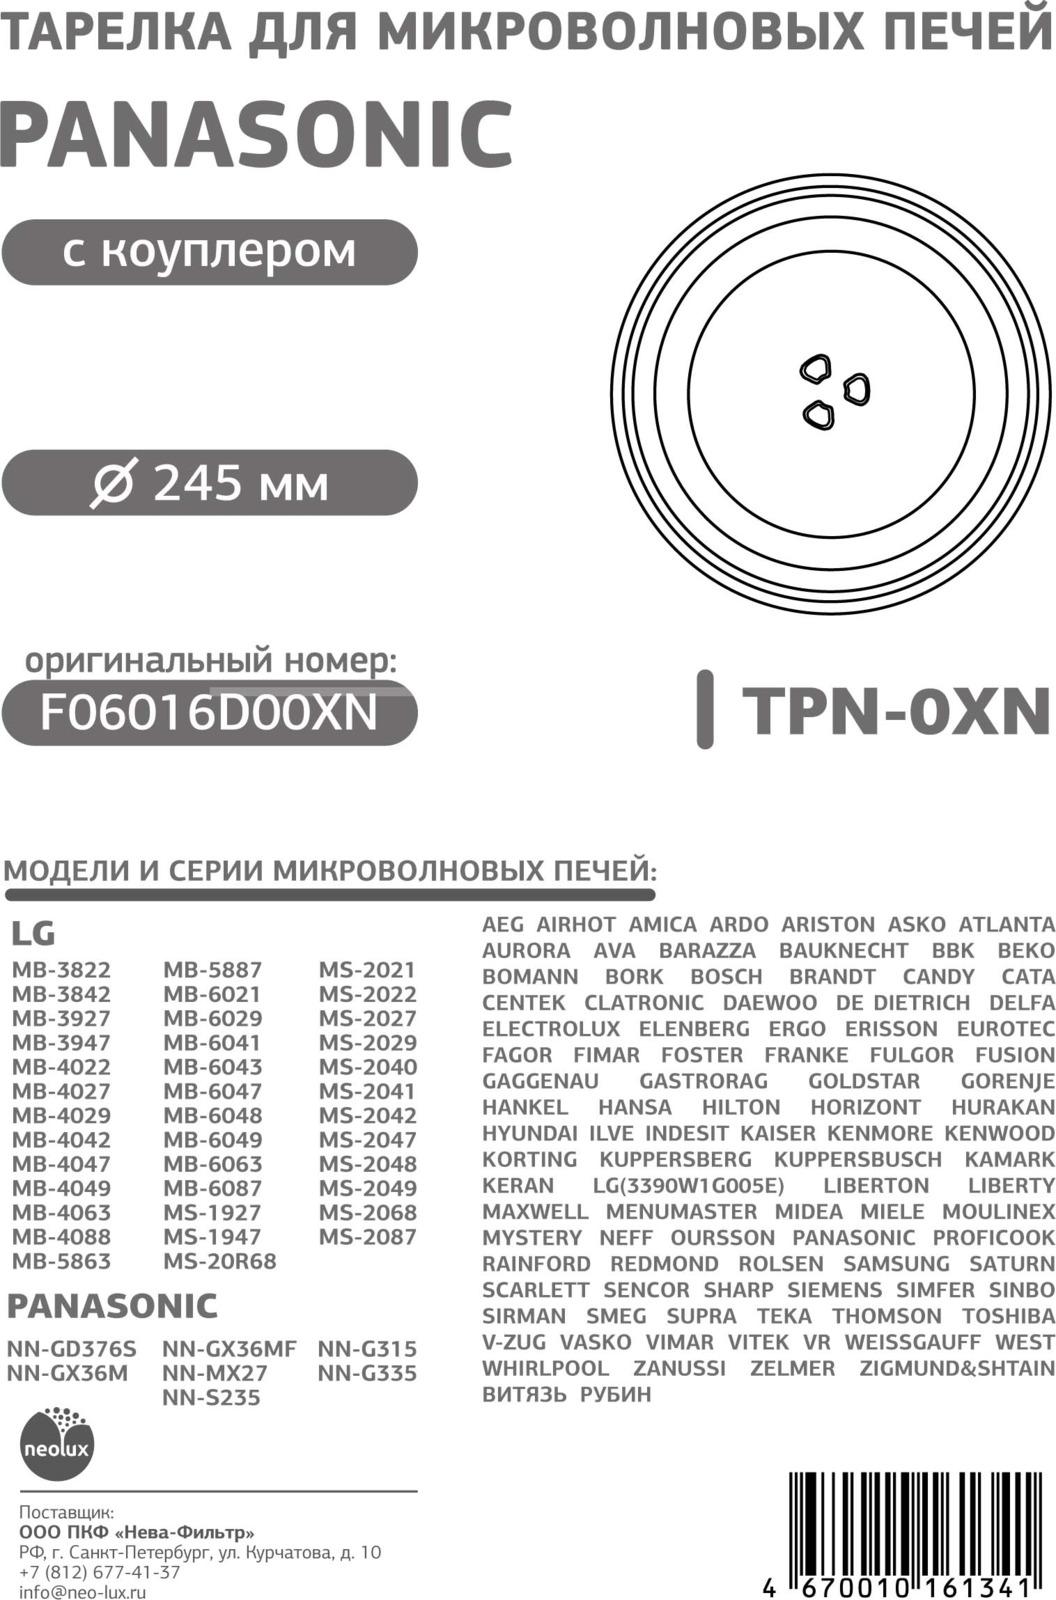 Neolux TPN-0XNтарелка для СВЧ Panasonic (245 мм с коуплером) Neolux